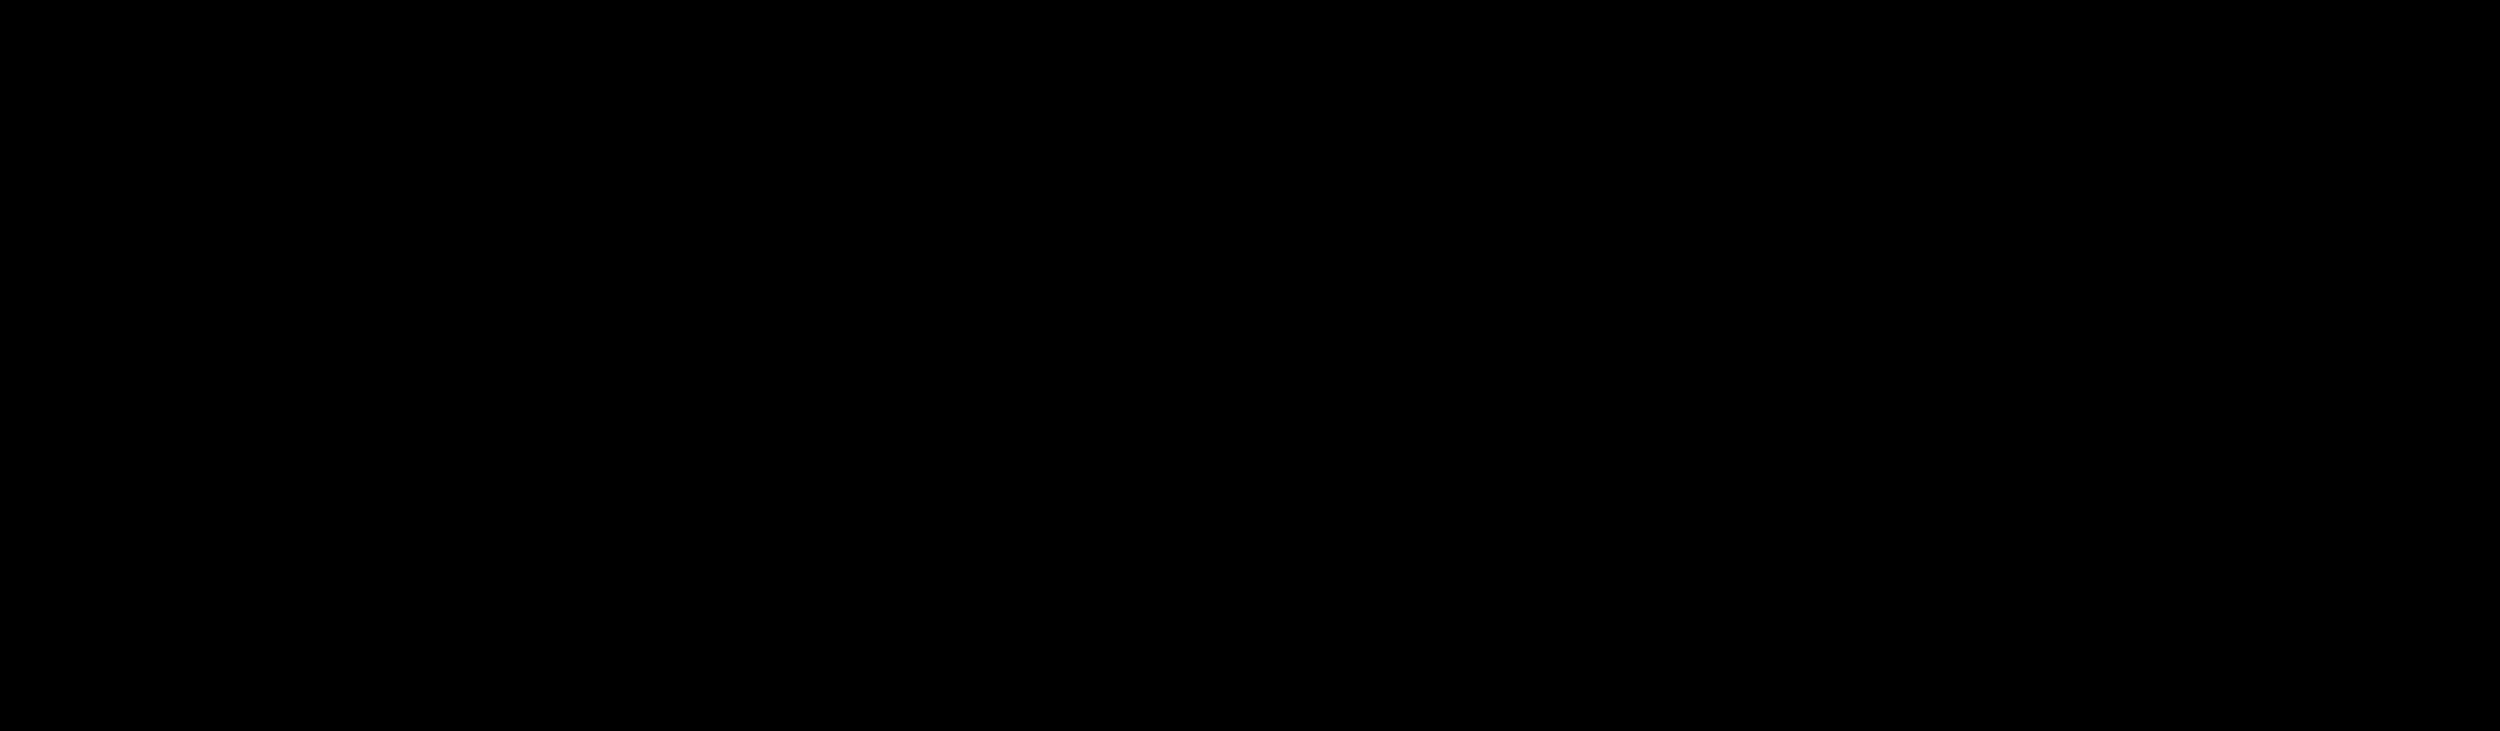 community groups logo black-01.png